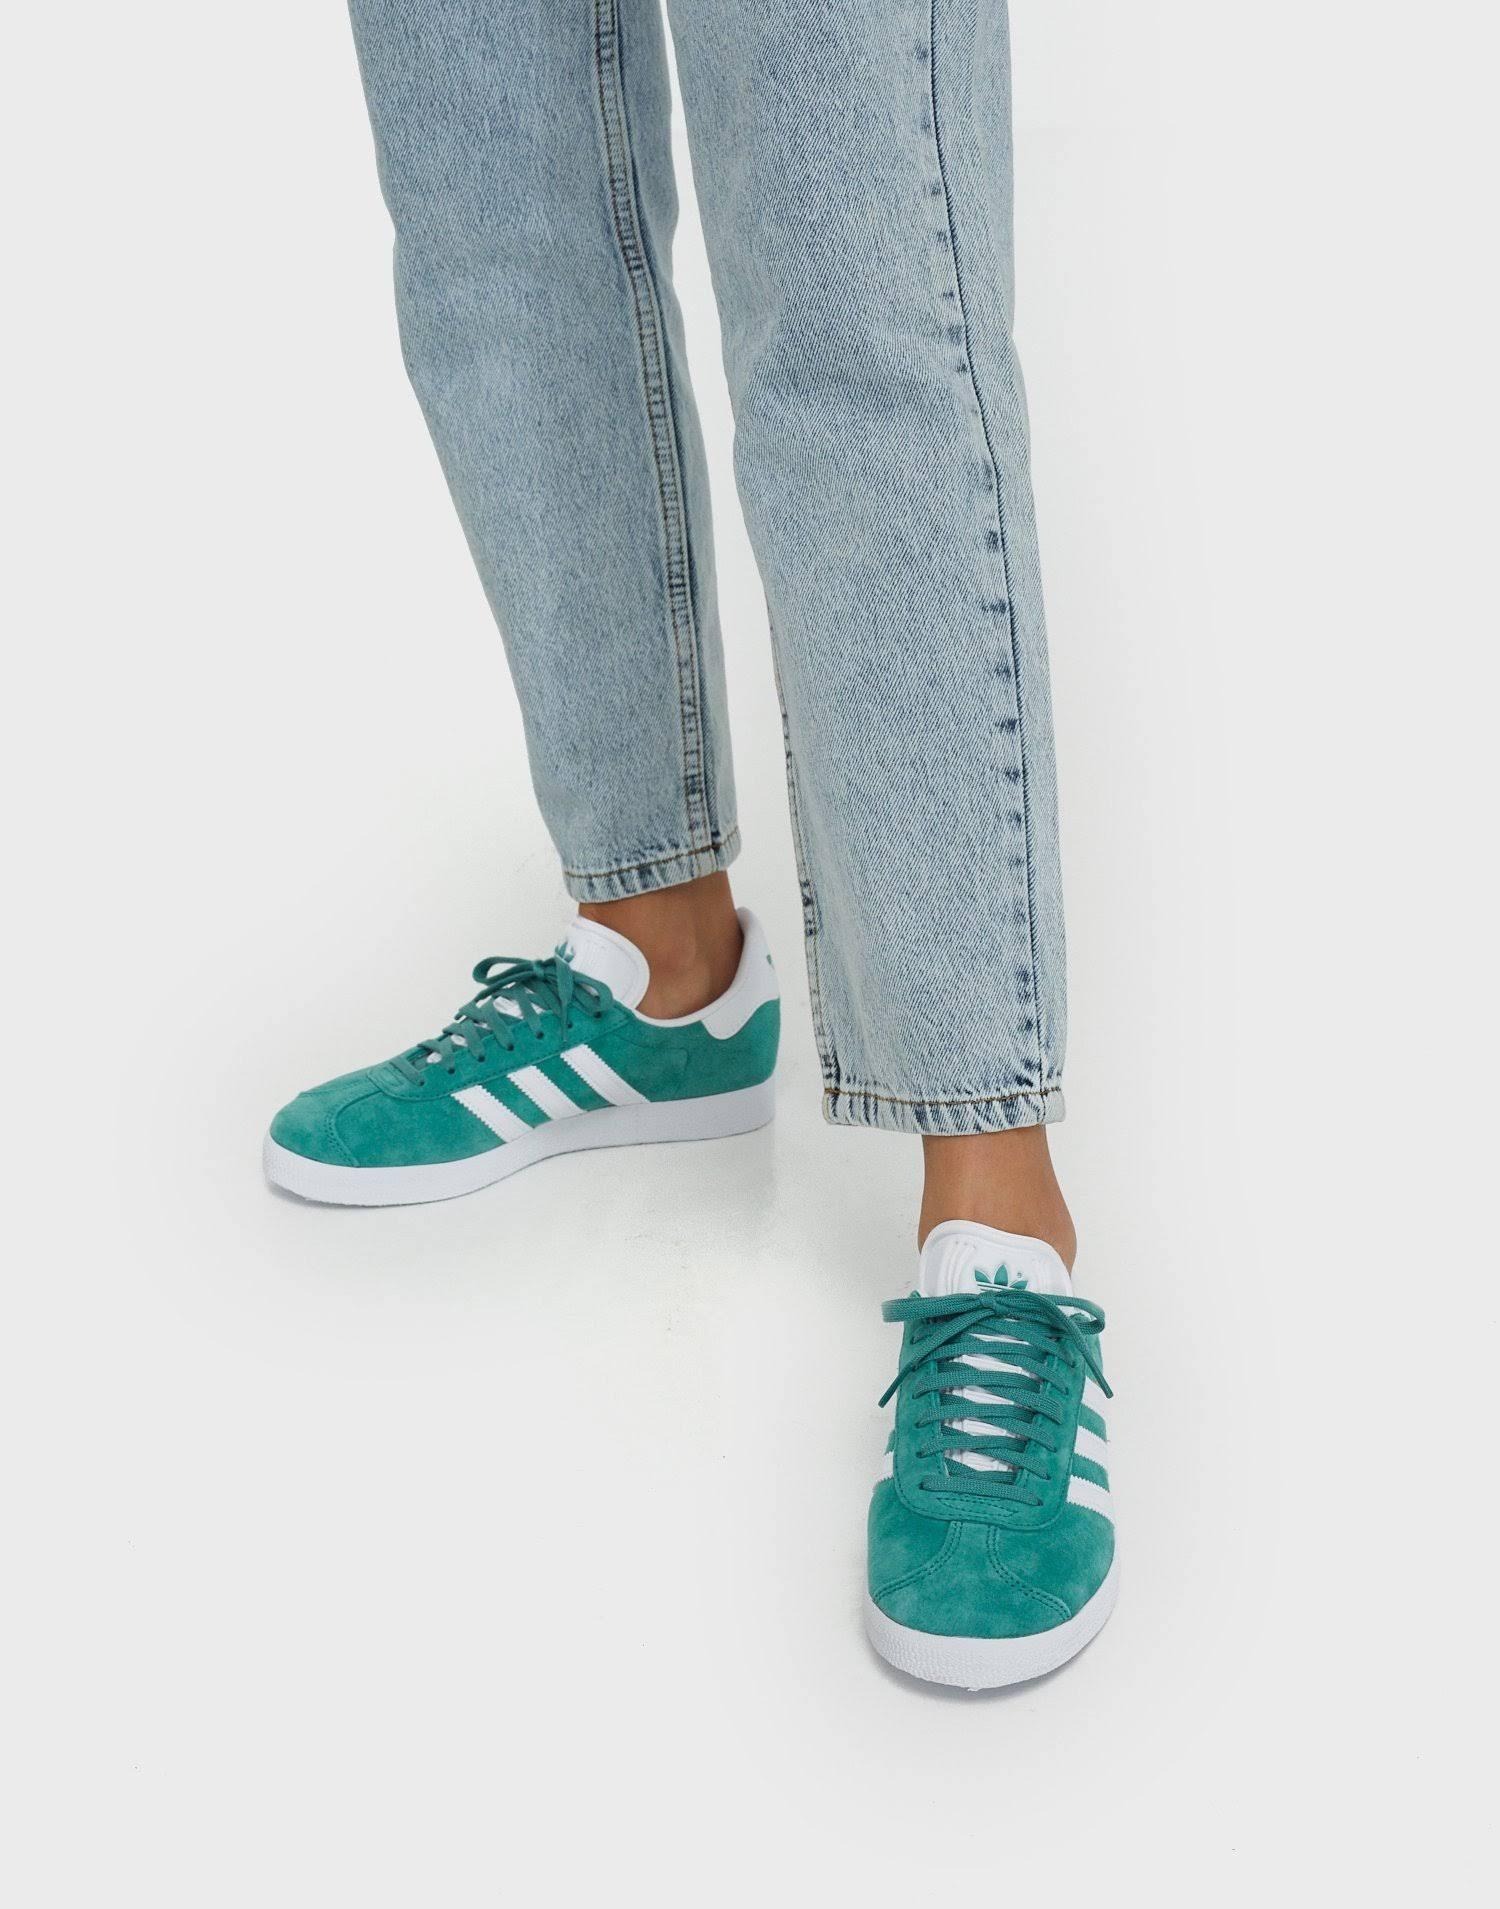 Adidas Originals - Low Top - Green - Gazelle - Sneakers